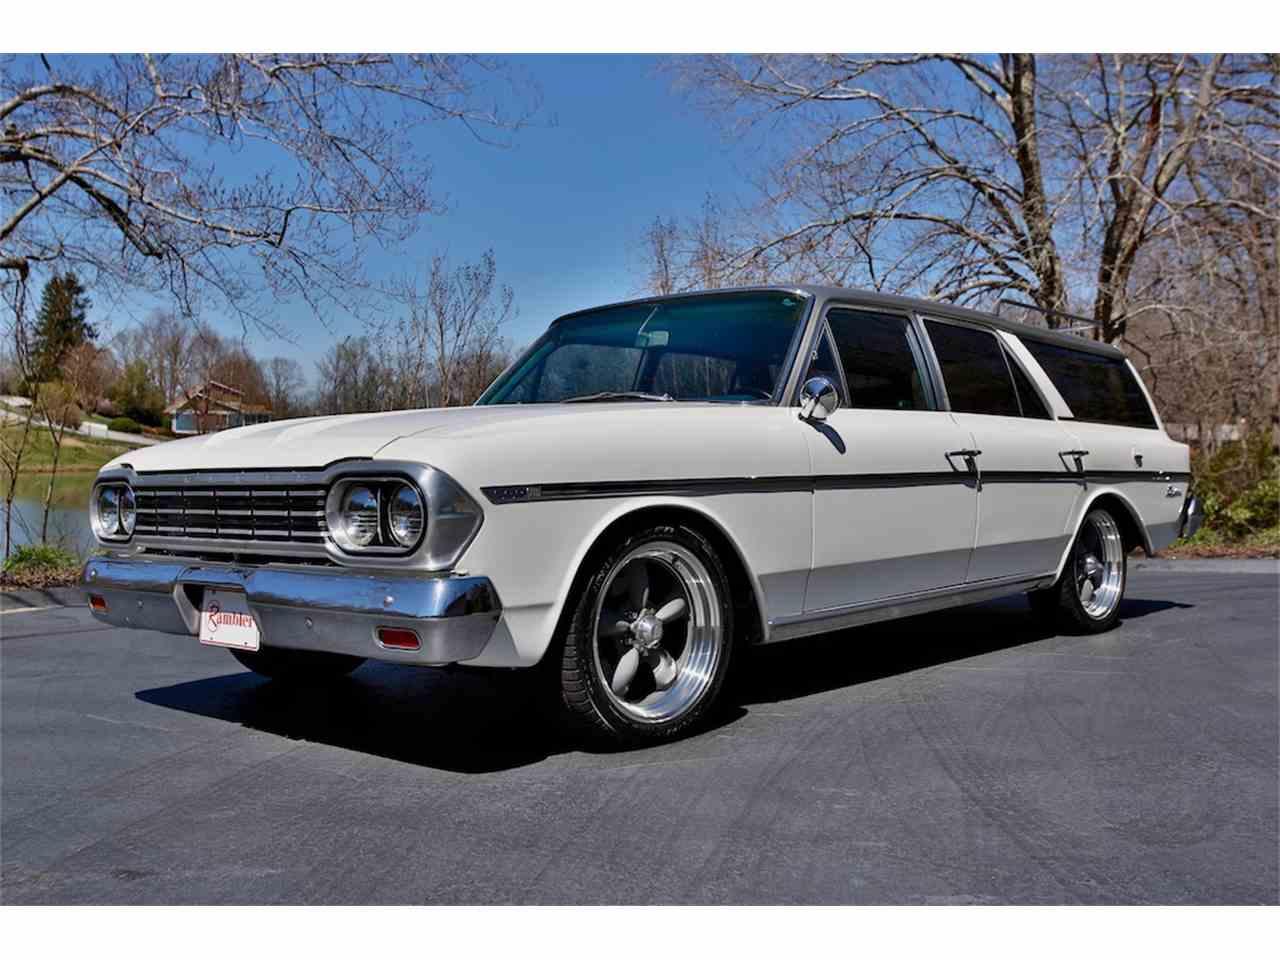 1964 AMC Rambler Station Wagon for Sale | ClassicCars.com | CC-974819